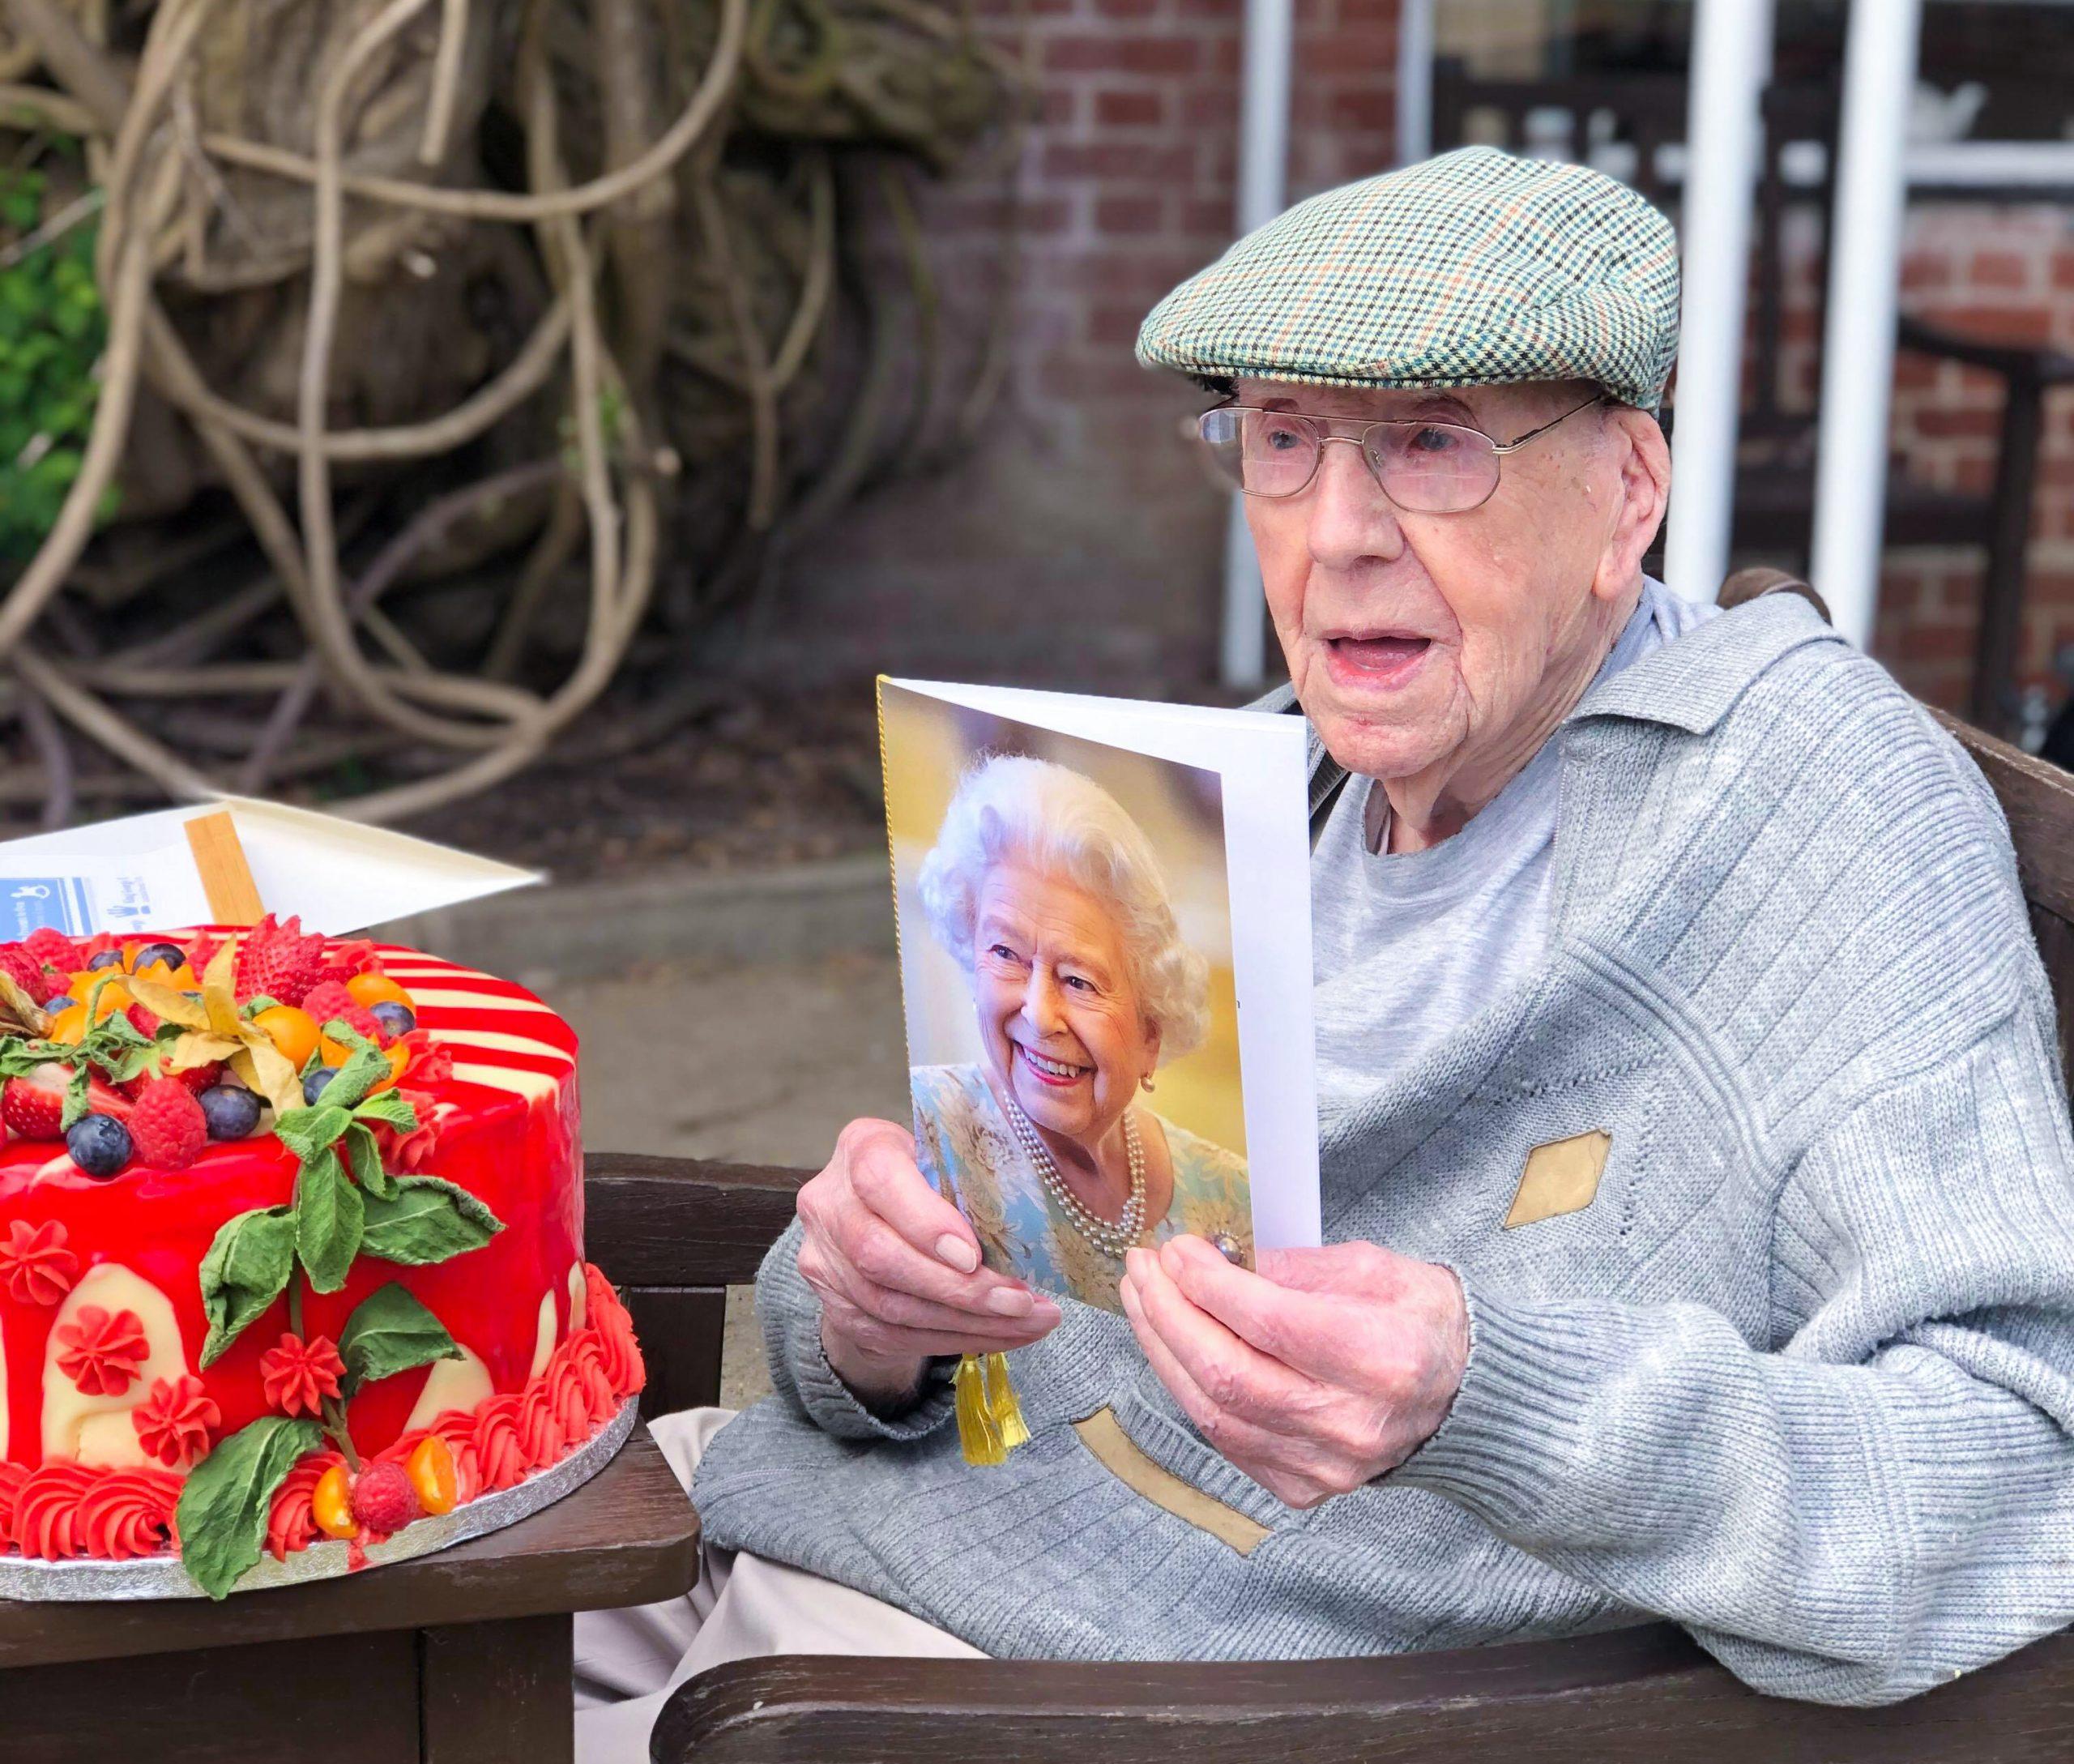 Alton Resident Bill during his 100th Birthday celebrations